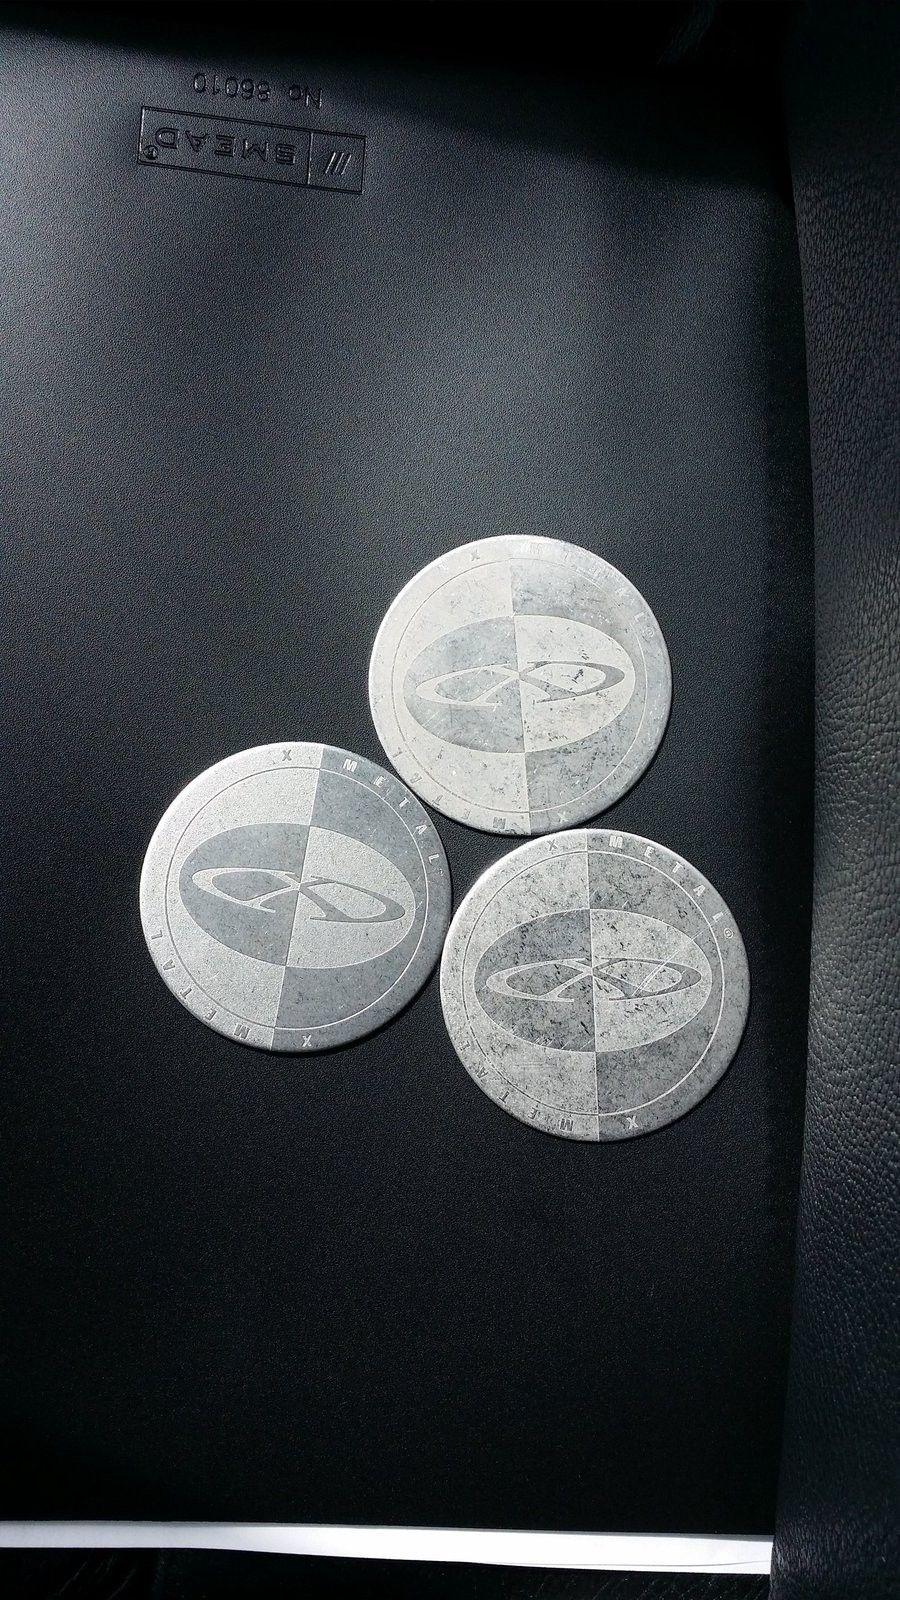 3 X Metal Coins - 20150910_121155.jpg